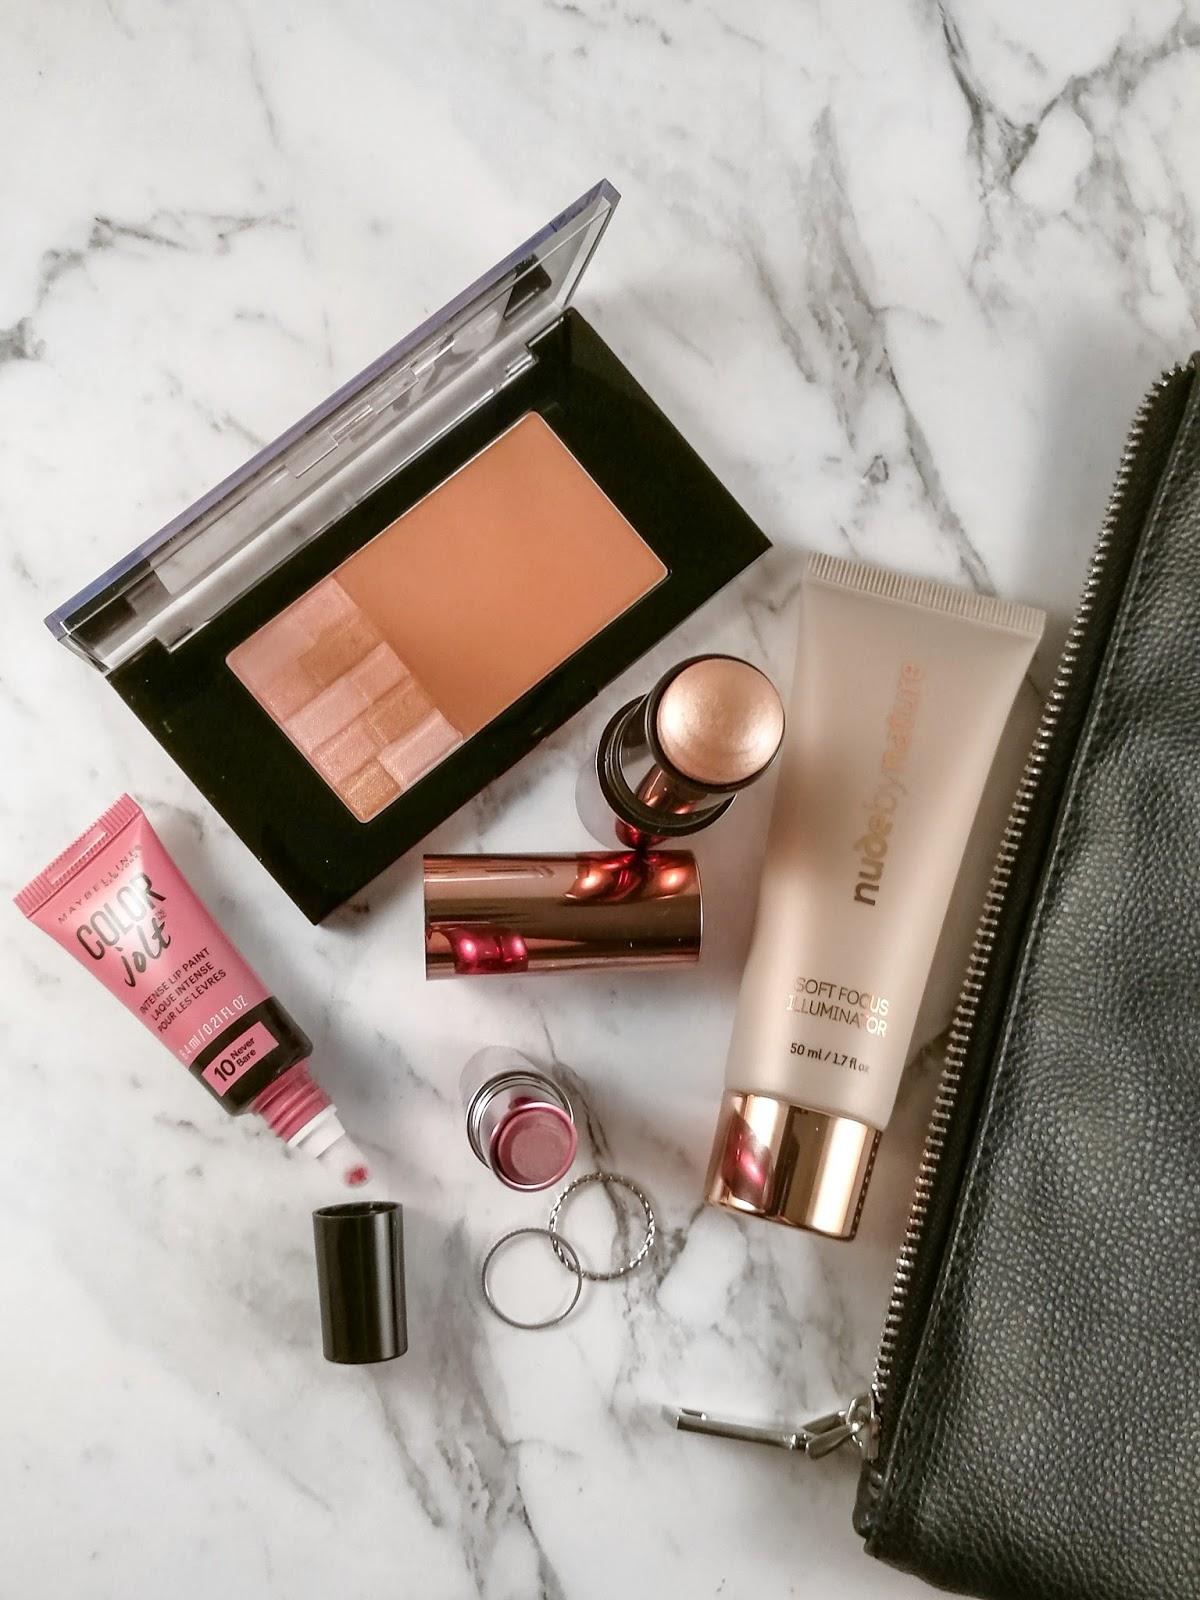 Filmpje: How to organize my makeup stash - BLONDIE BEAUTY